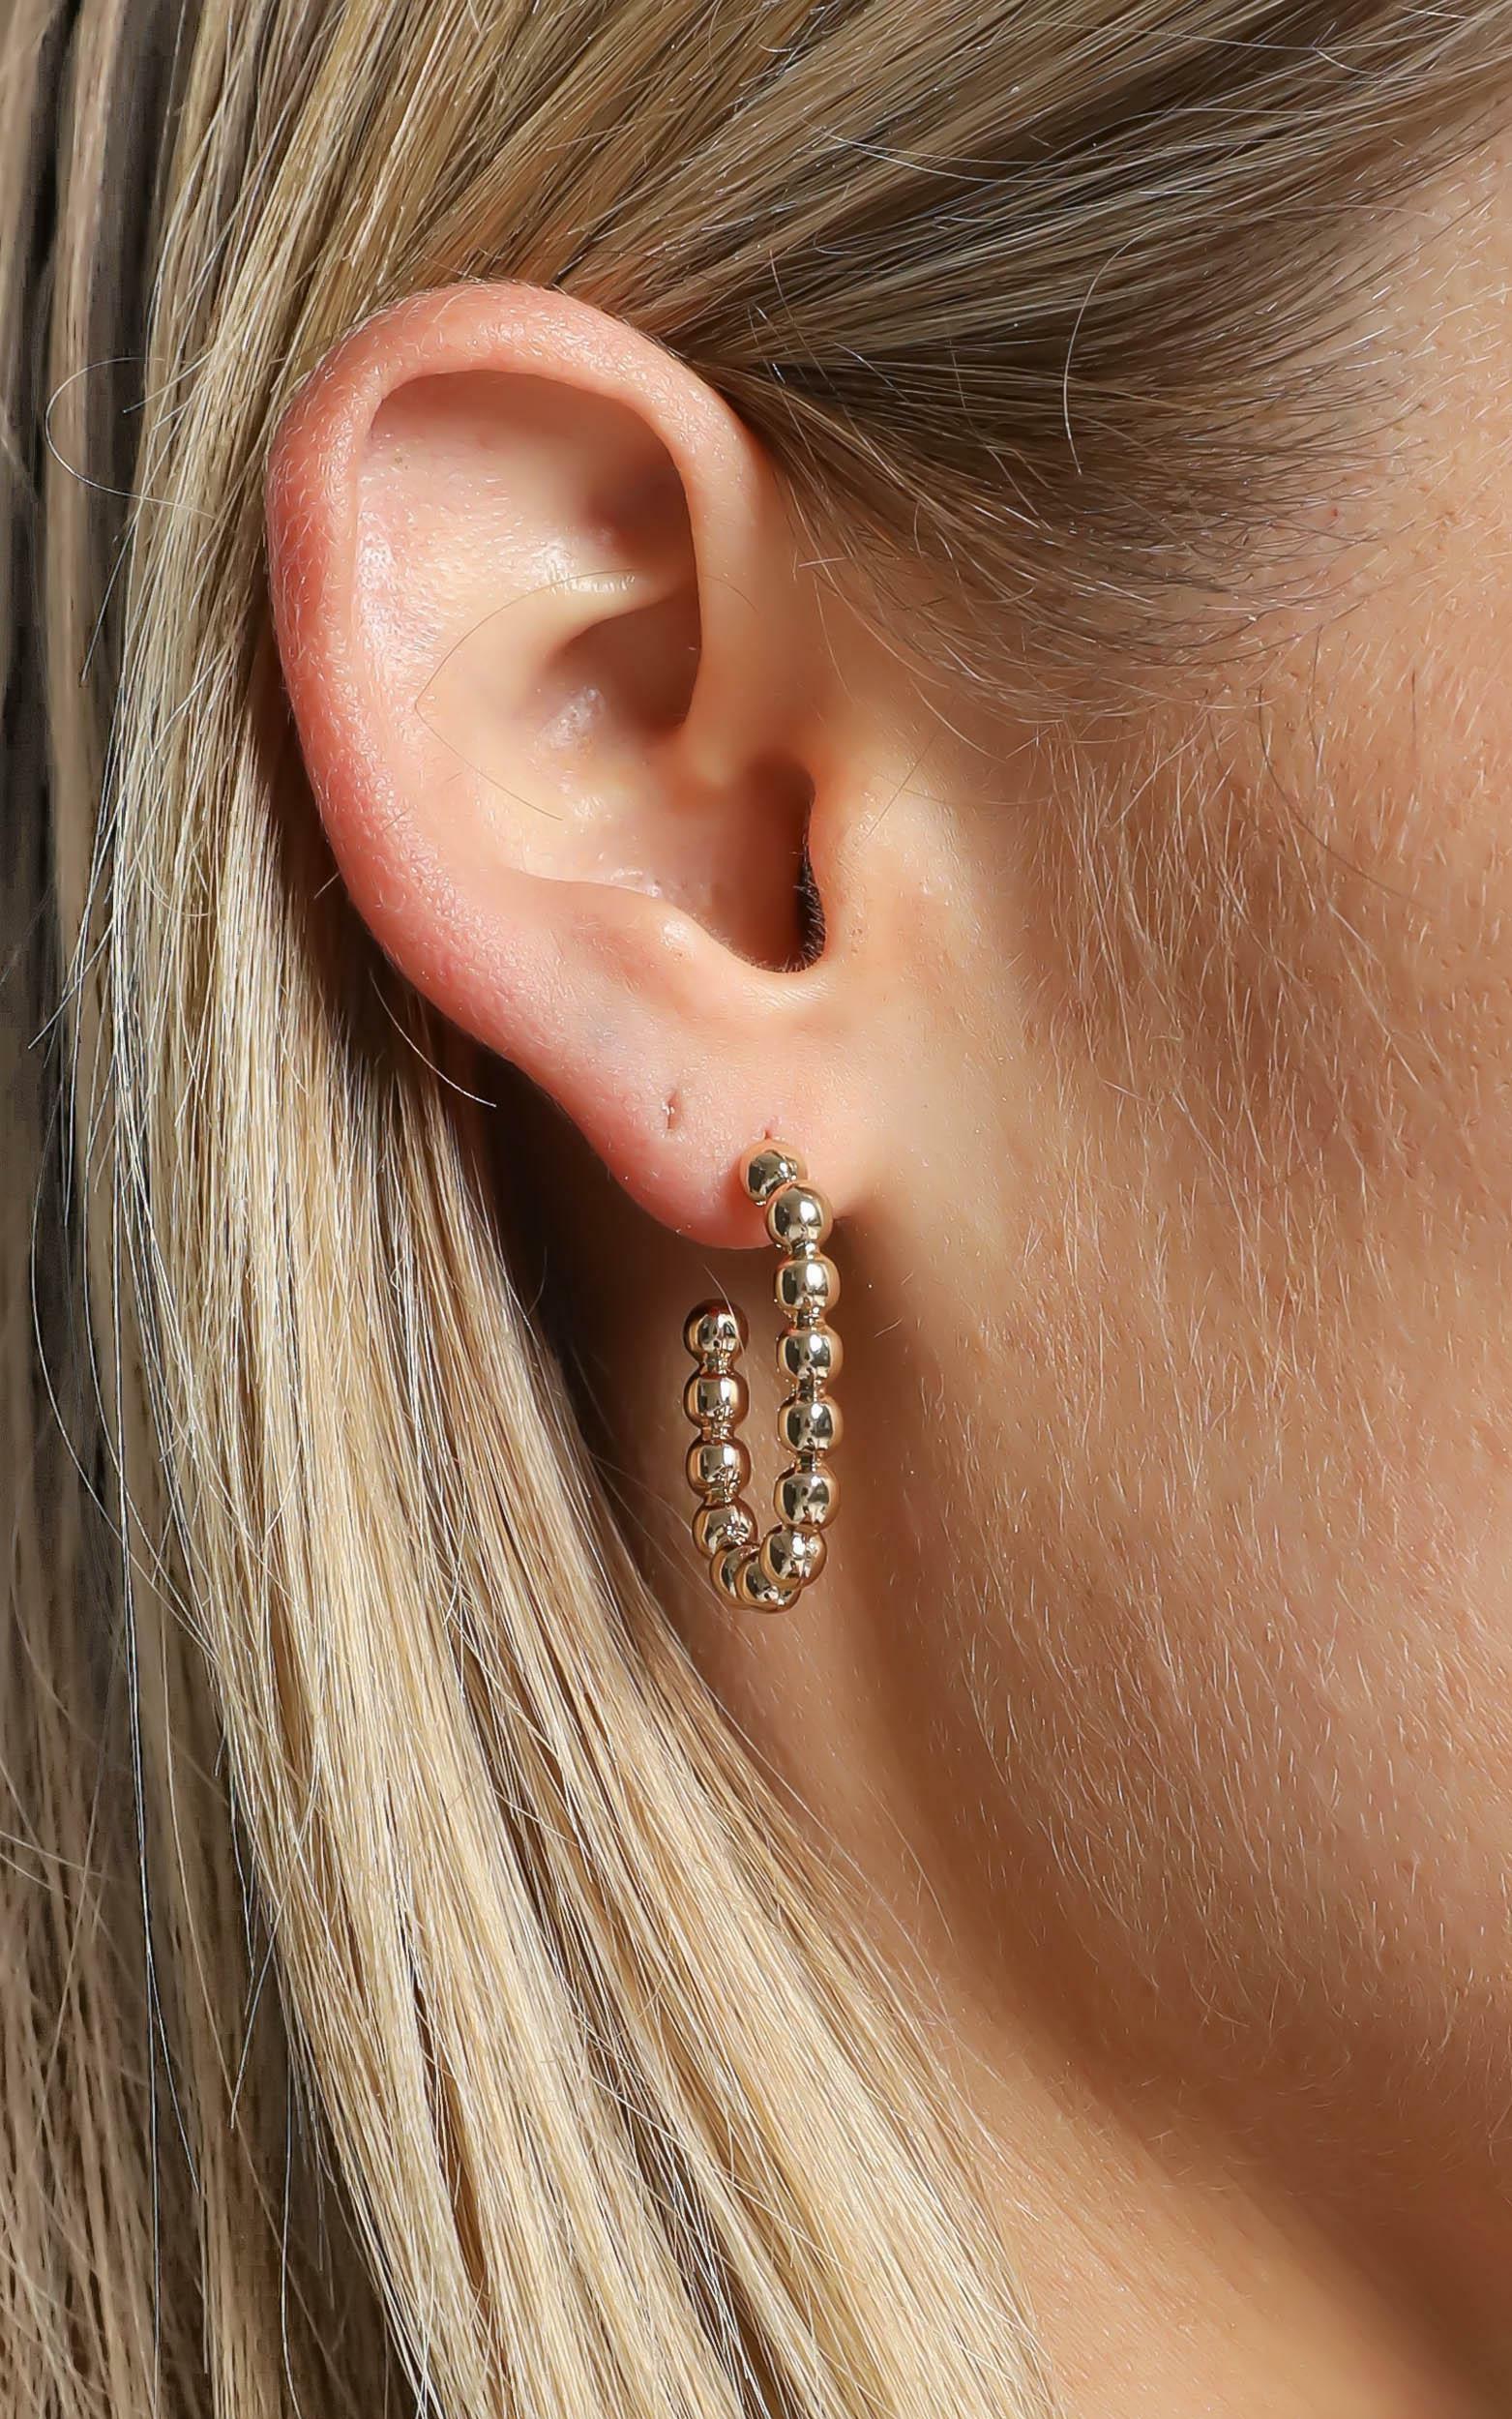 Jasper Earrings in Gold, , hi-res image number null